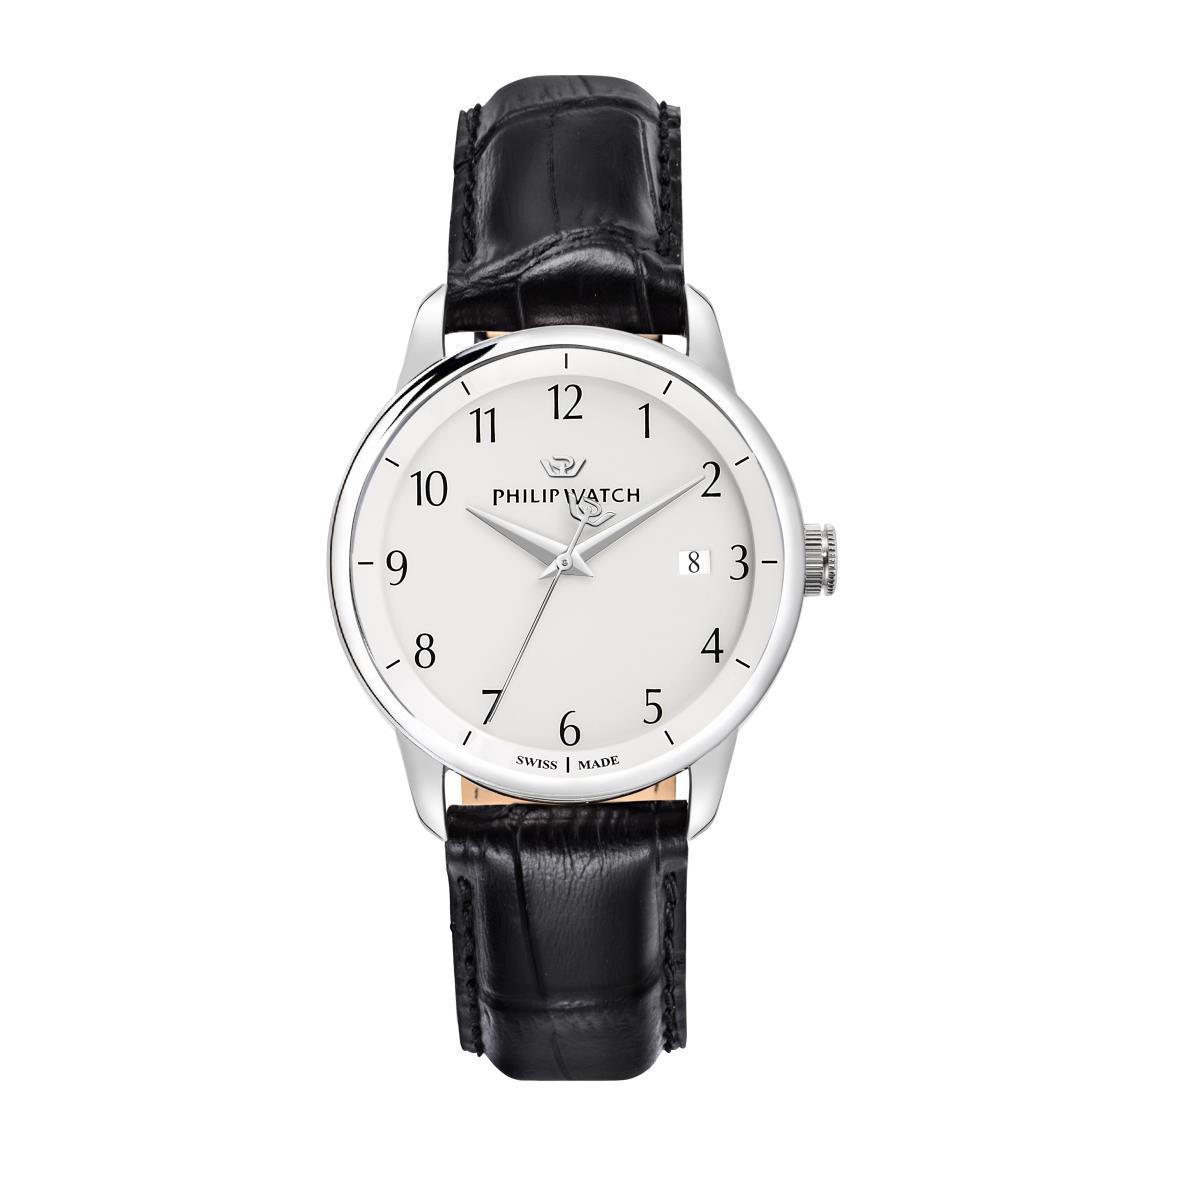 Orologio Philip Watch - Anniversary Ref. R8251150002 - PHILIP WATCH